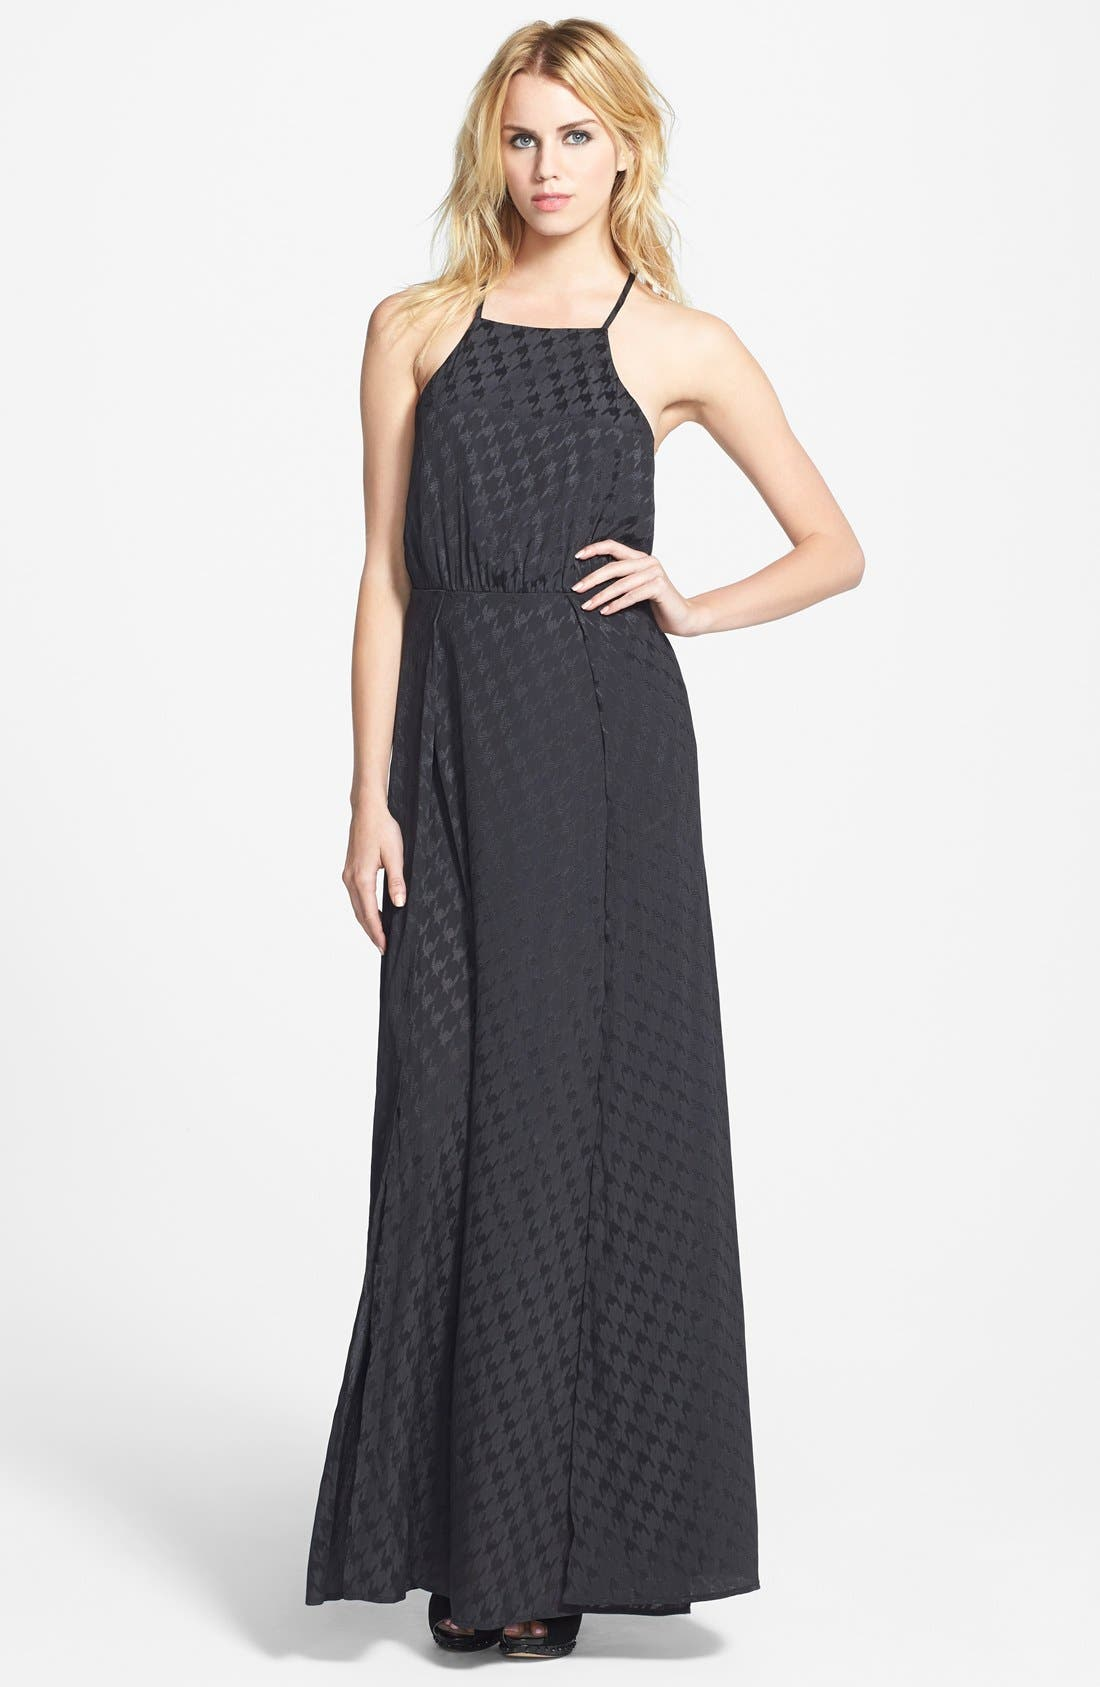 ASTR Jacquard Houndstooth Maxi Dress,                             Main thumbnail 1, color,                             001